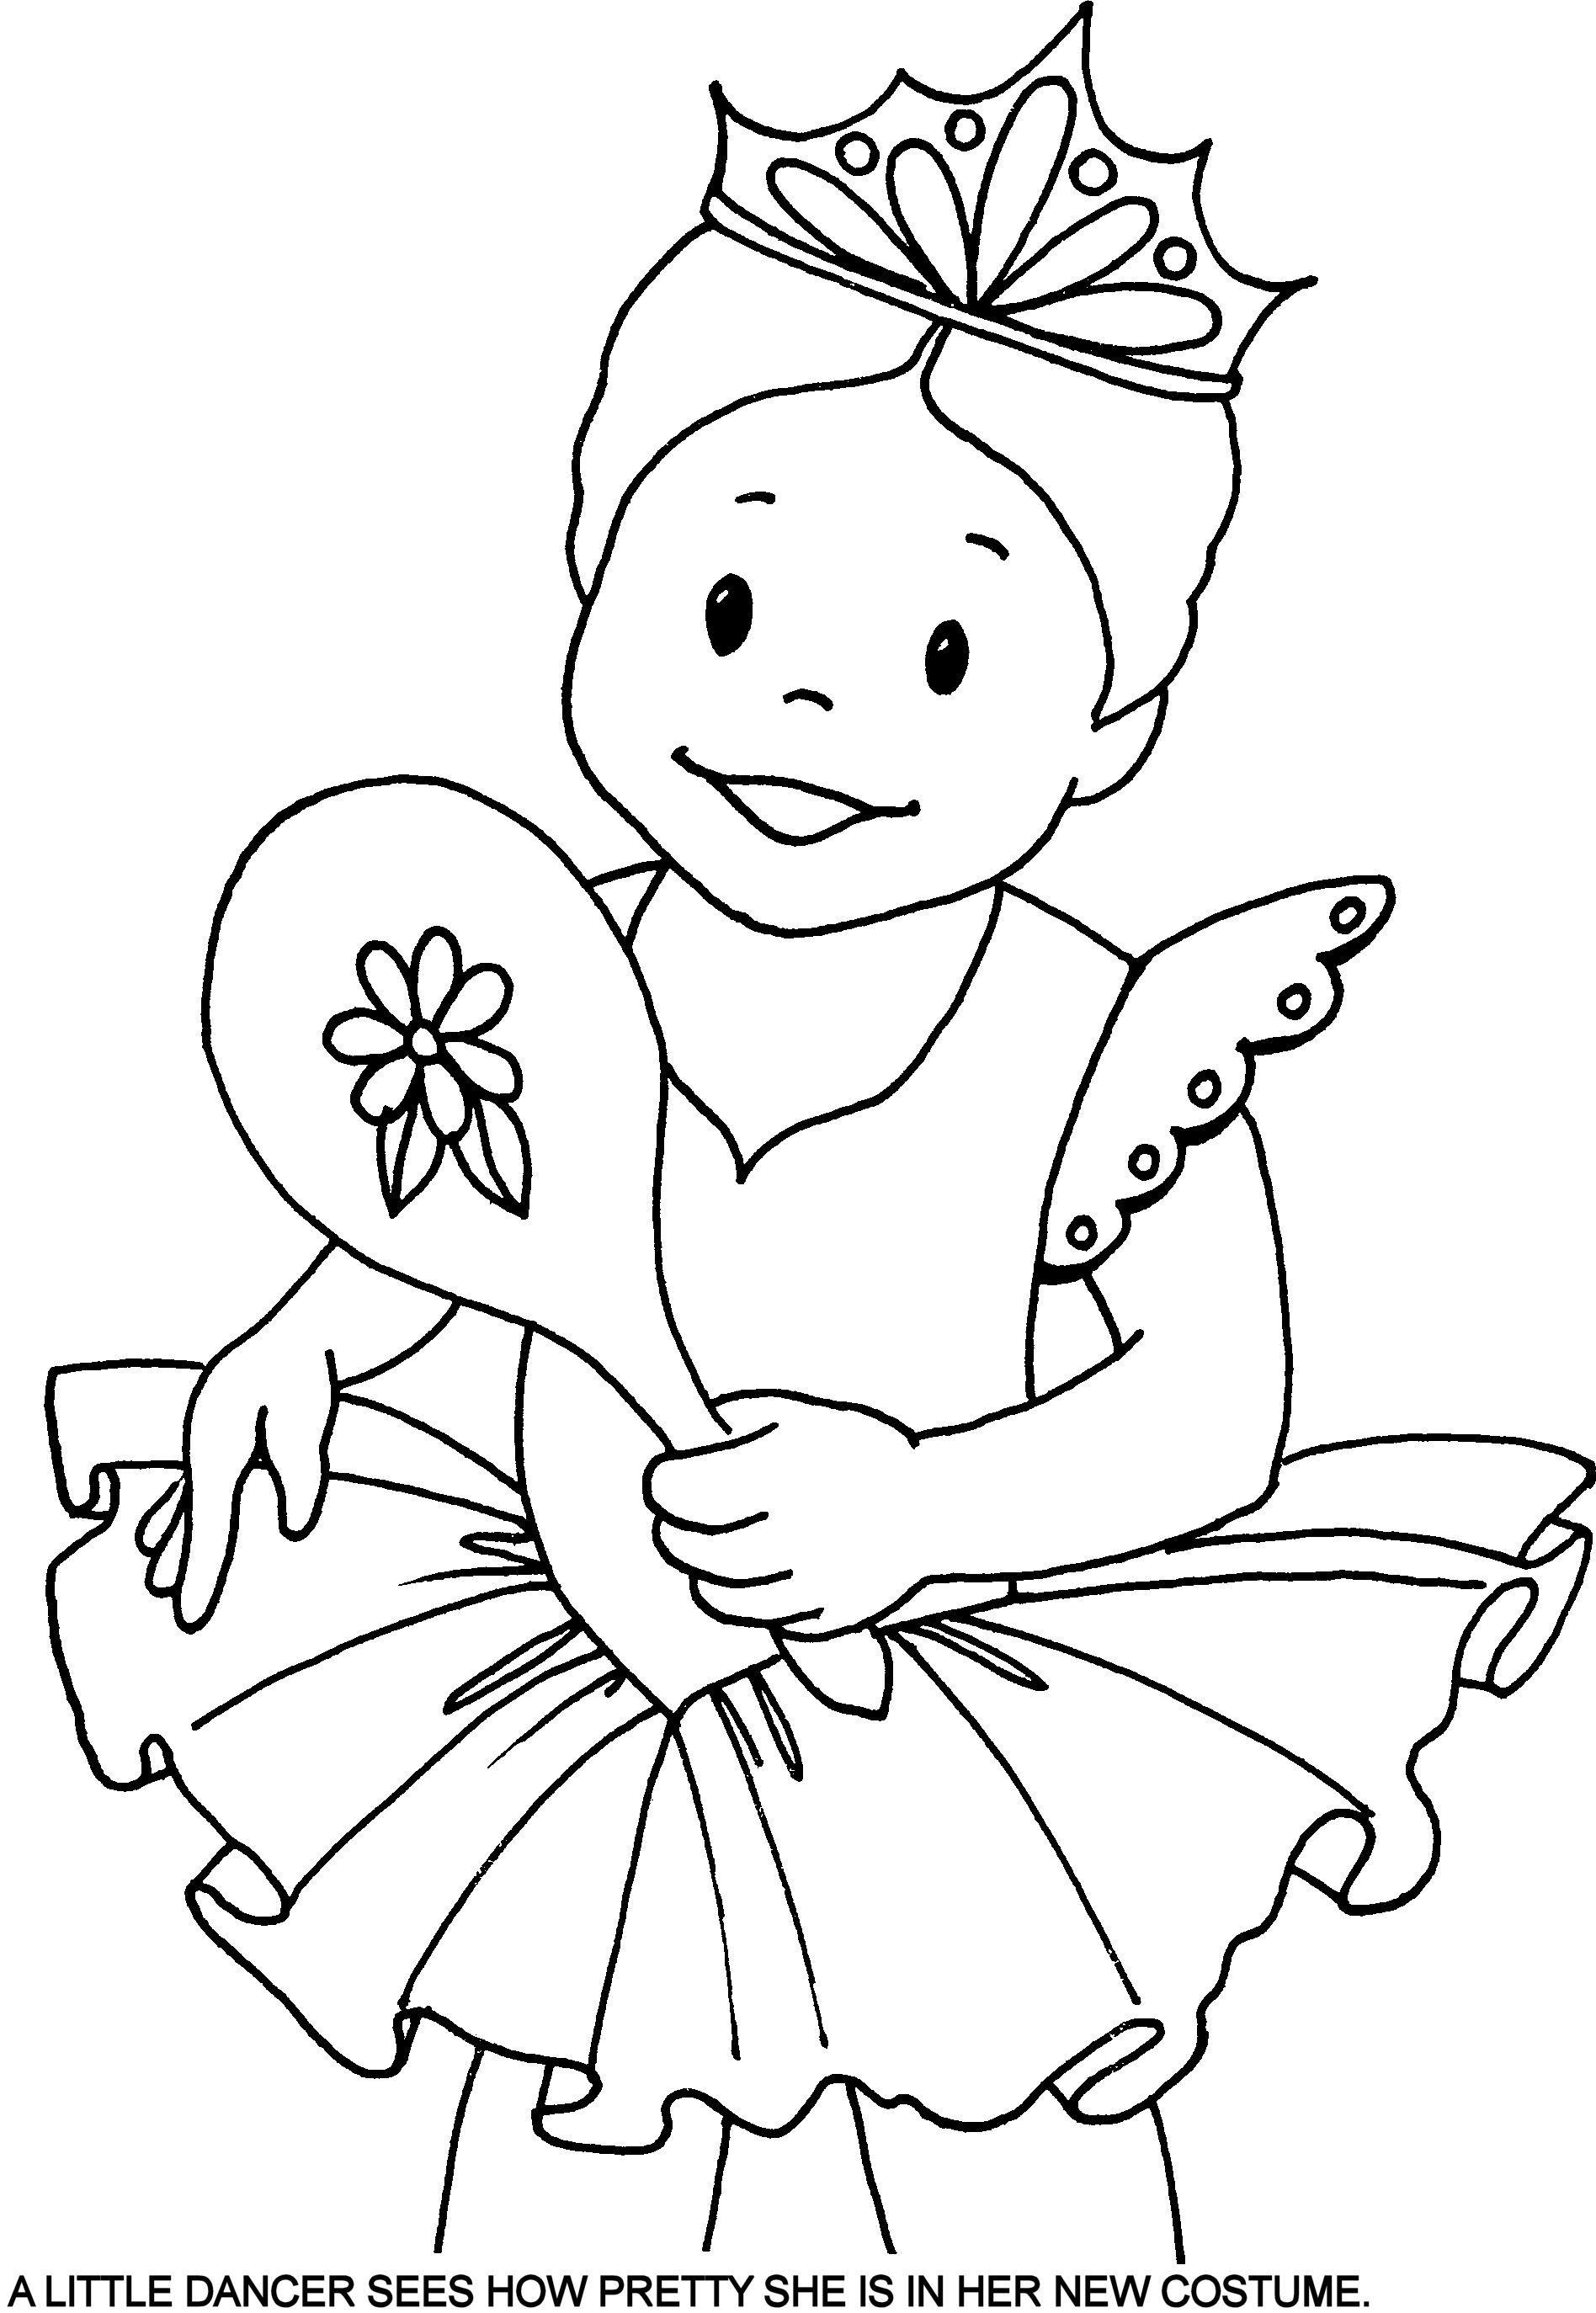 baby ballerina | dibujos para pintar y bordar | Pinterest | Dibujos ...